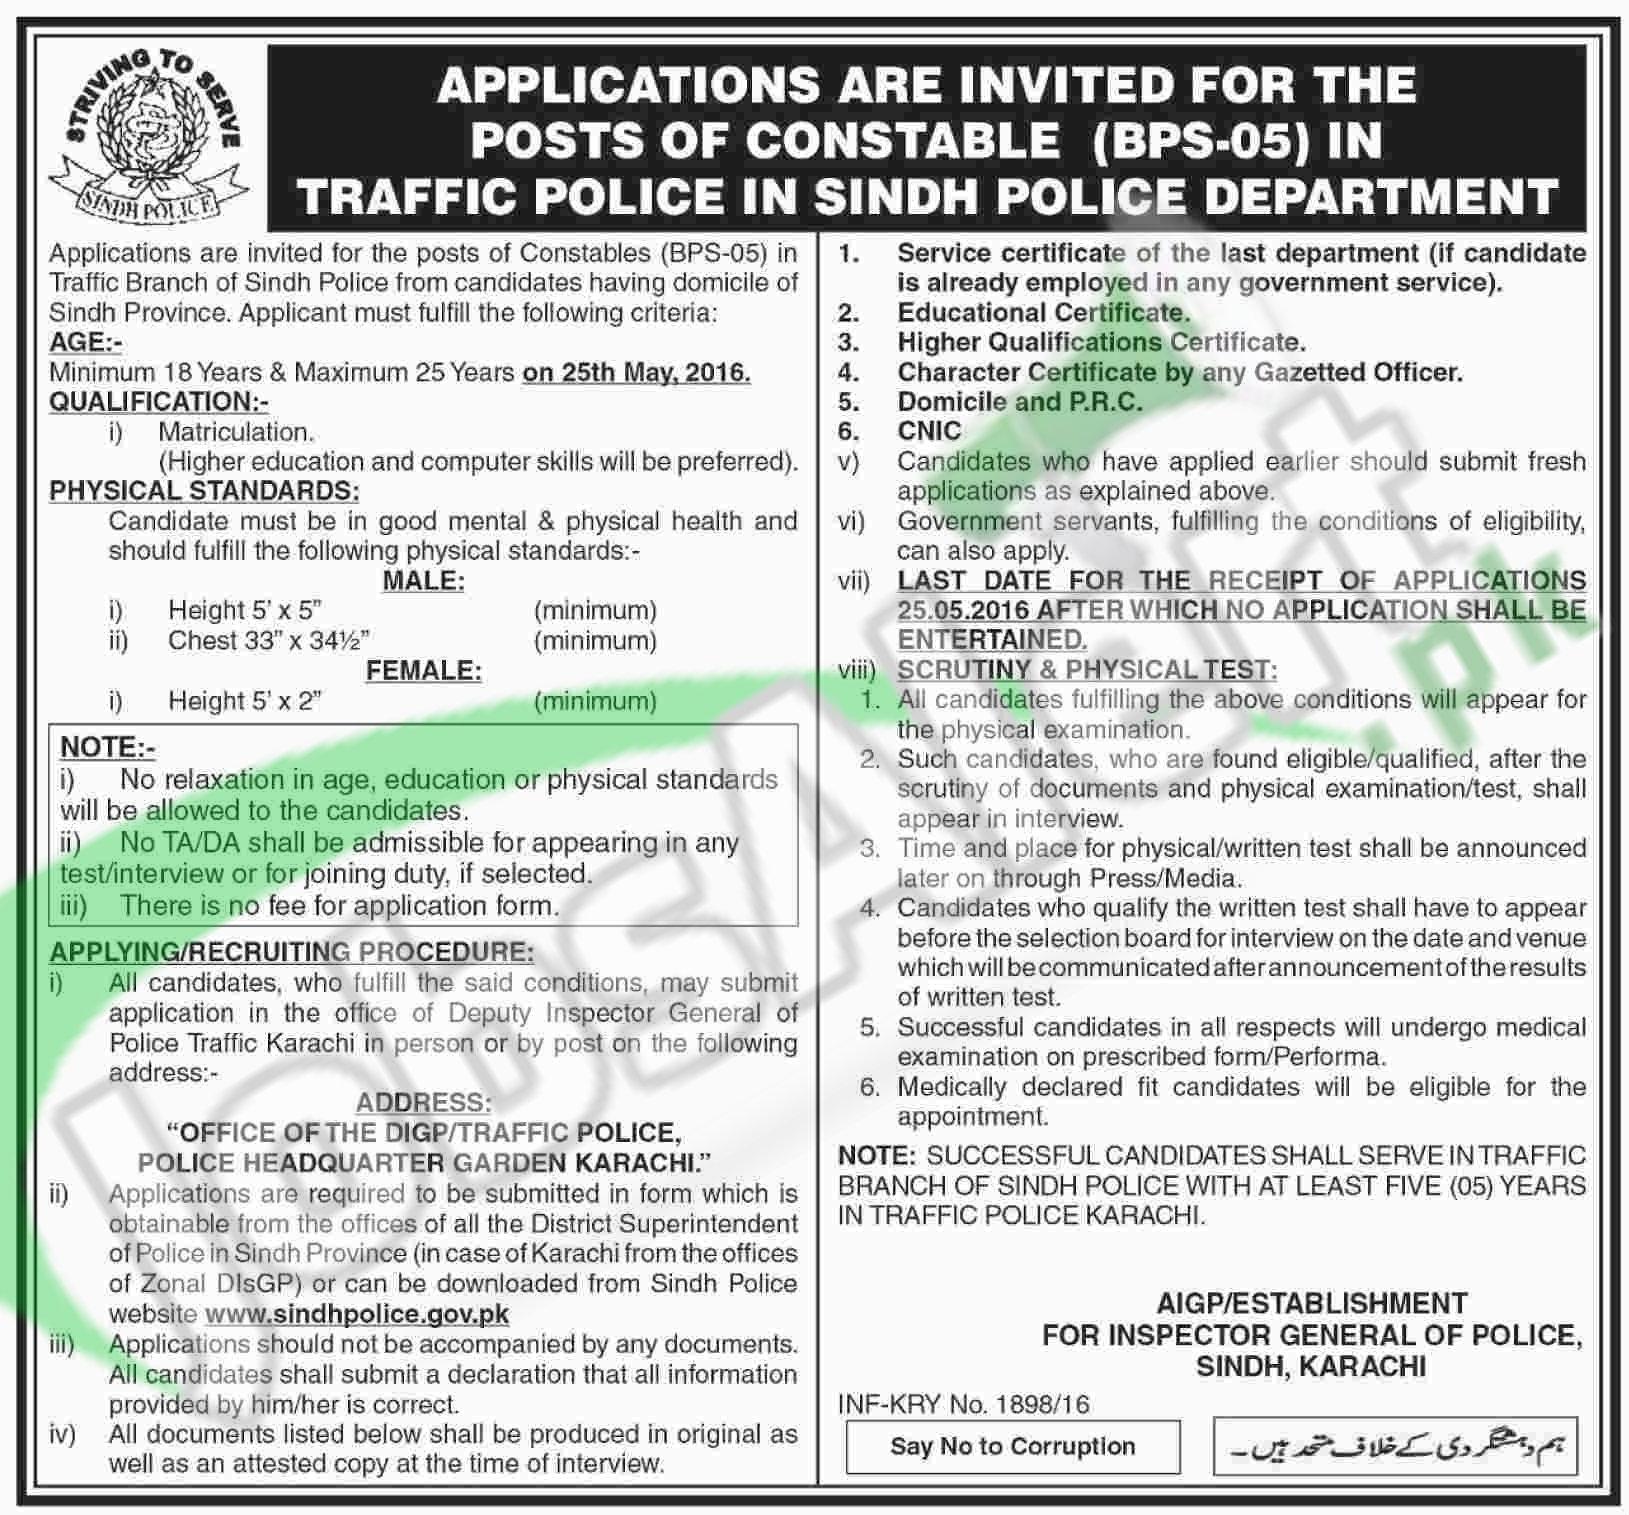 Sindh Traffic Police Department